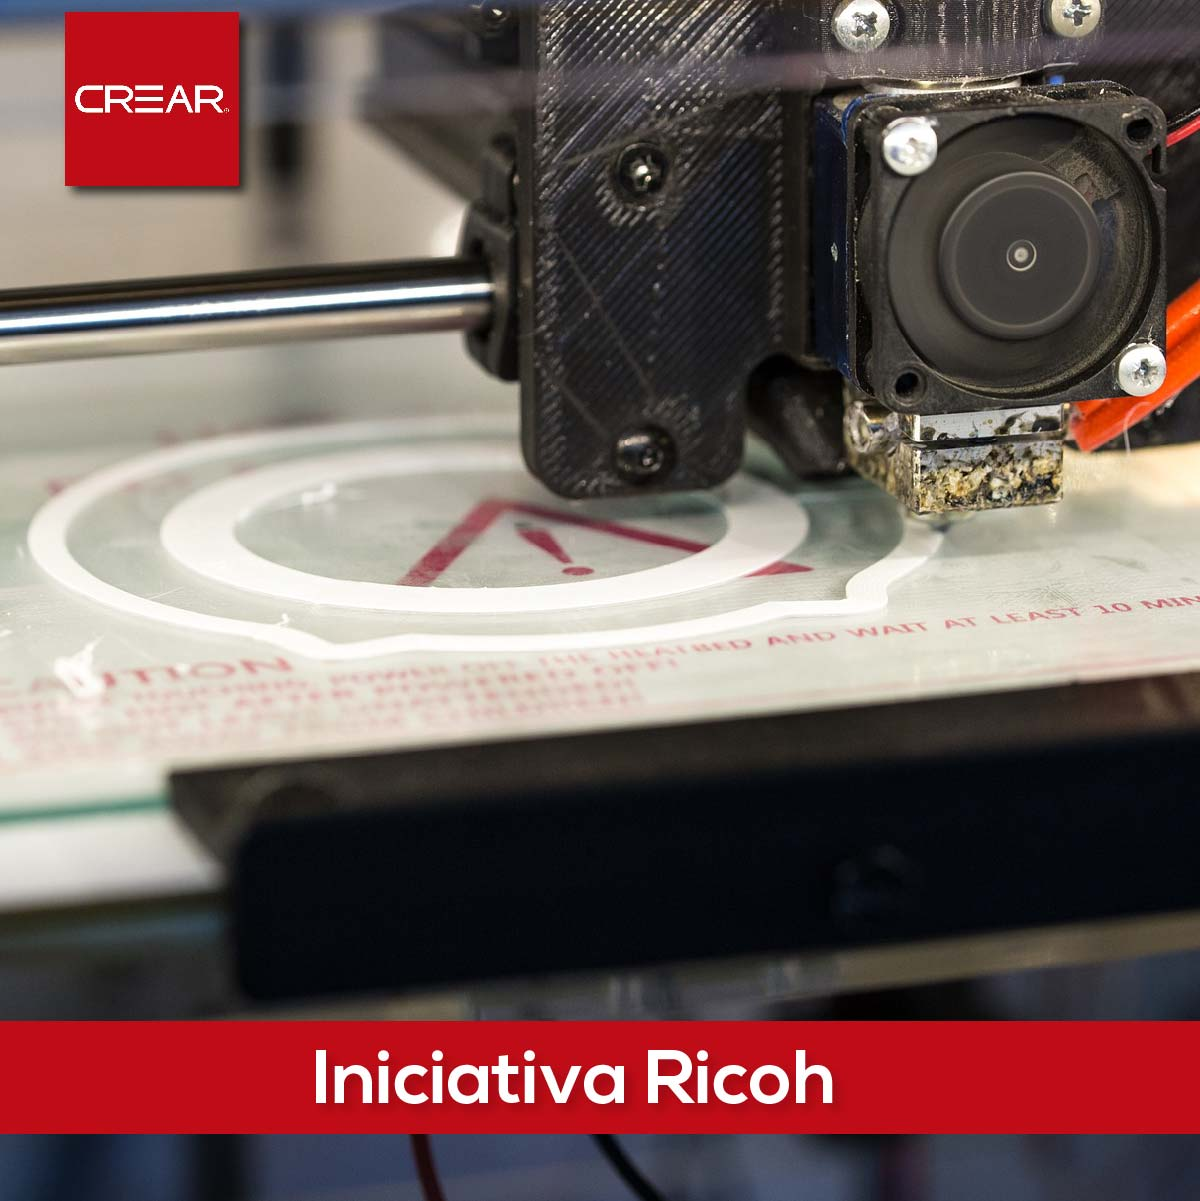 Iniciativa De Ricoh